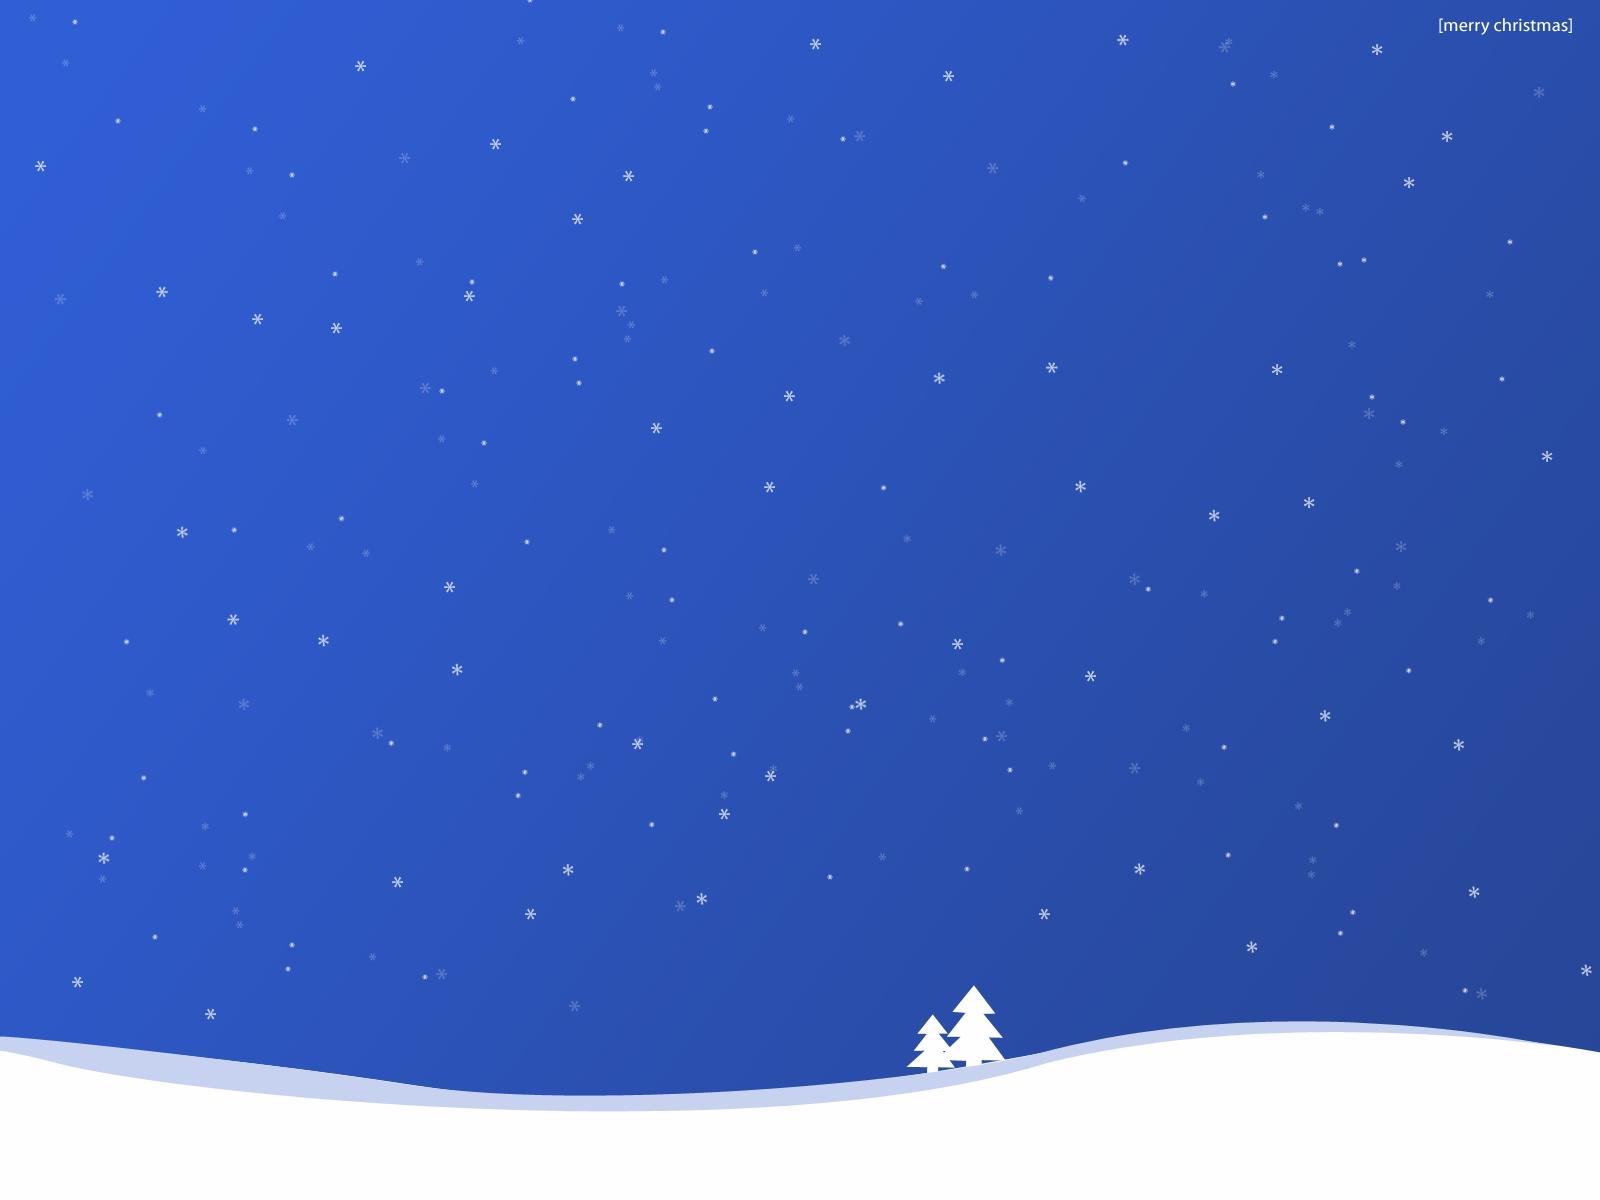 Snowy Christmas Scene Google Wallpapers Snowy Christmas Scene Google 1600x1200